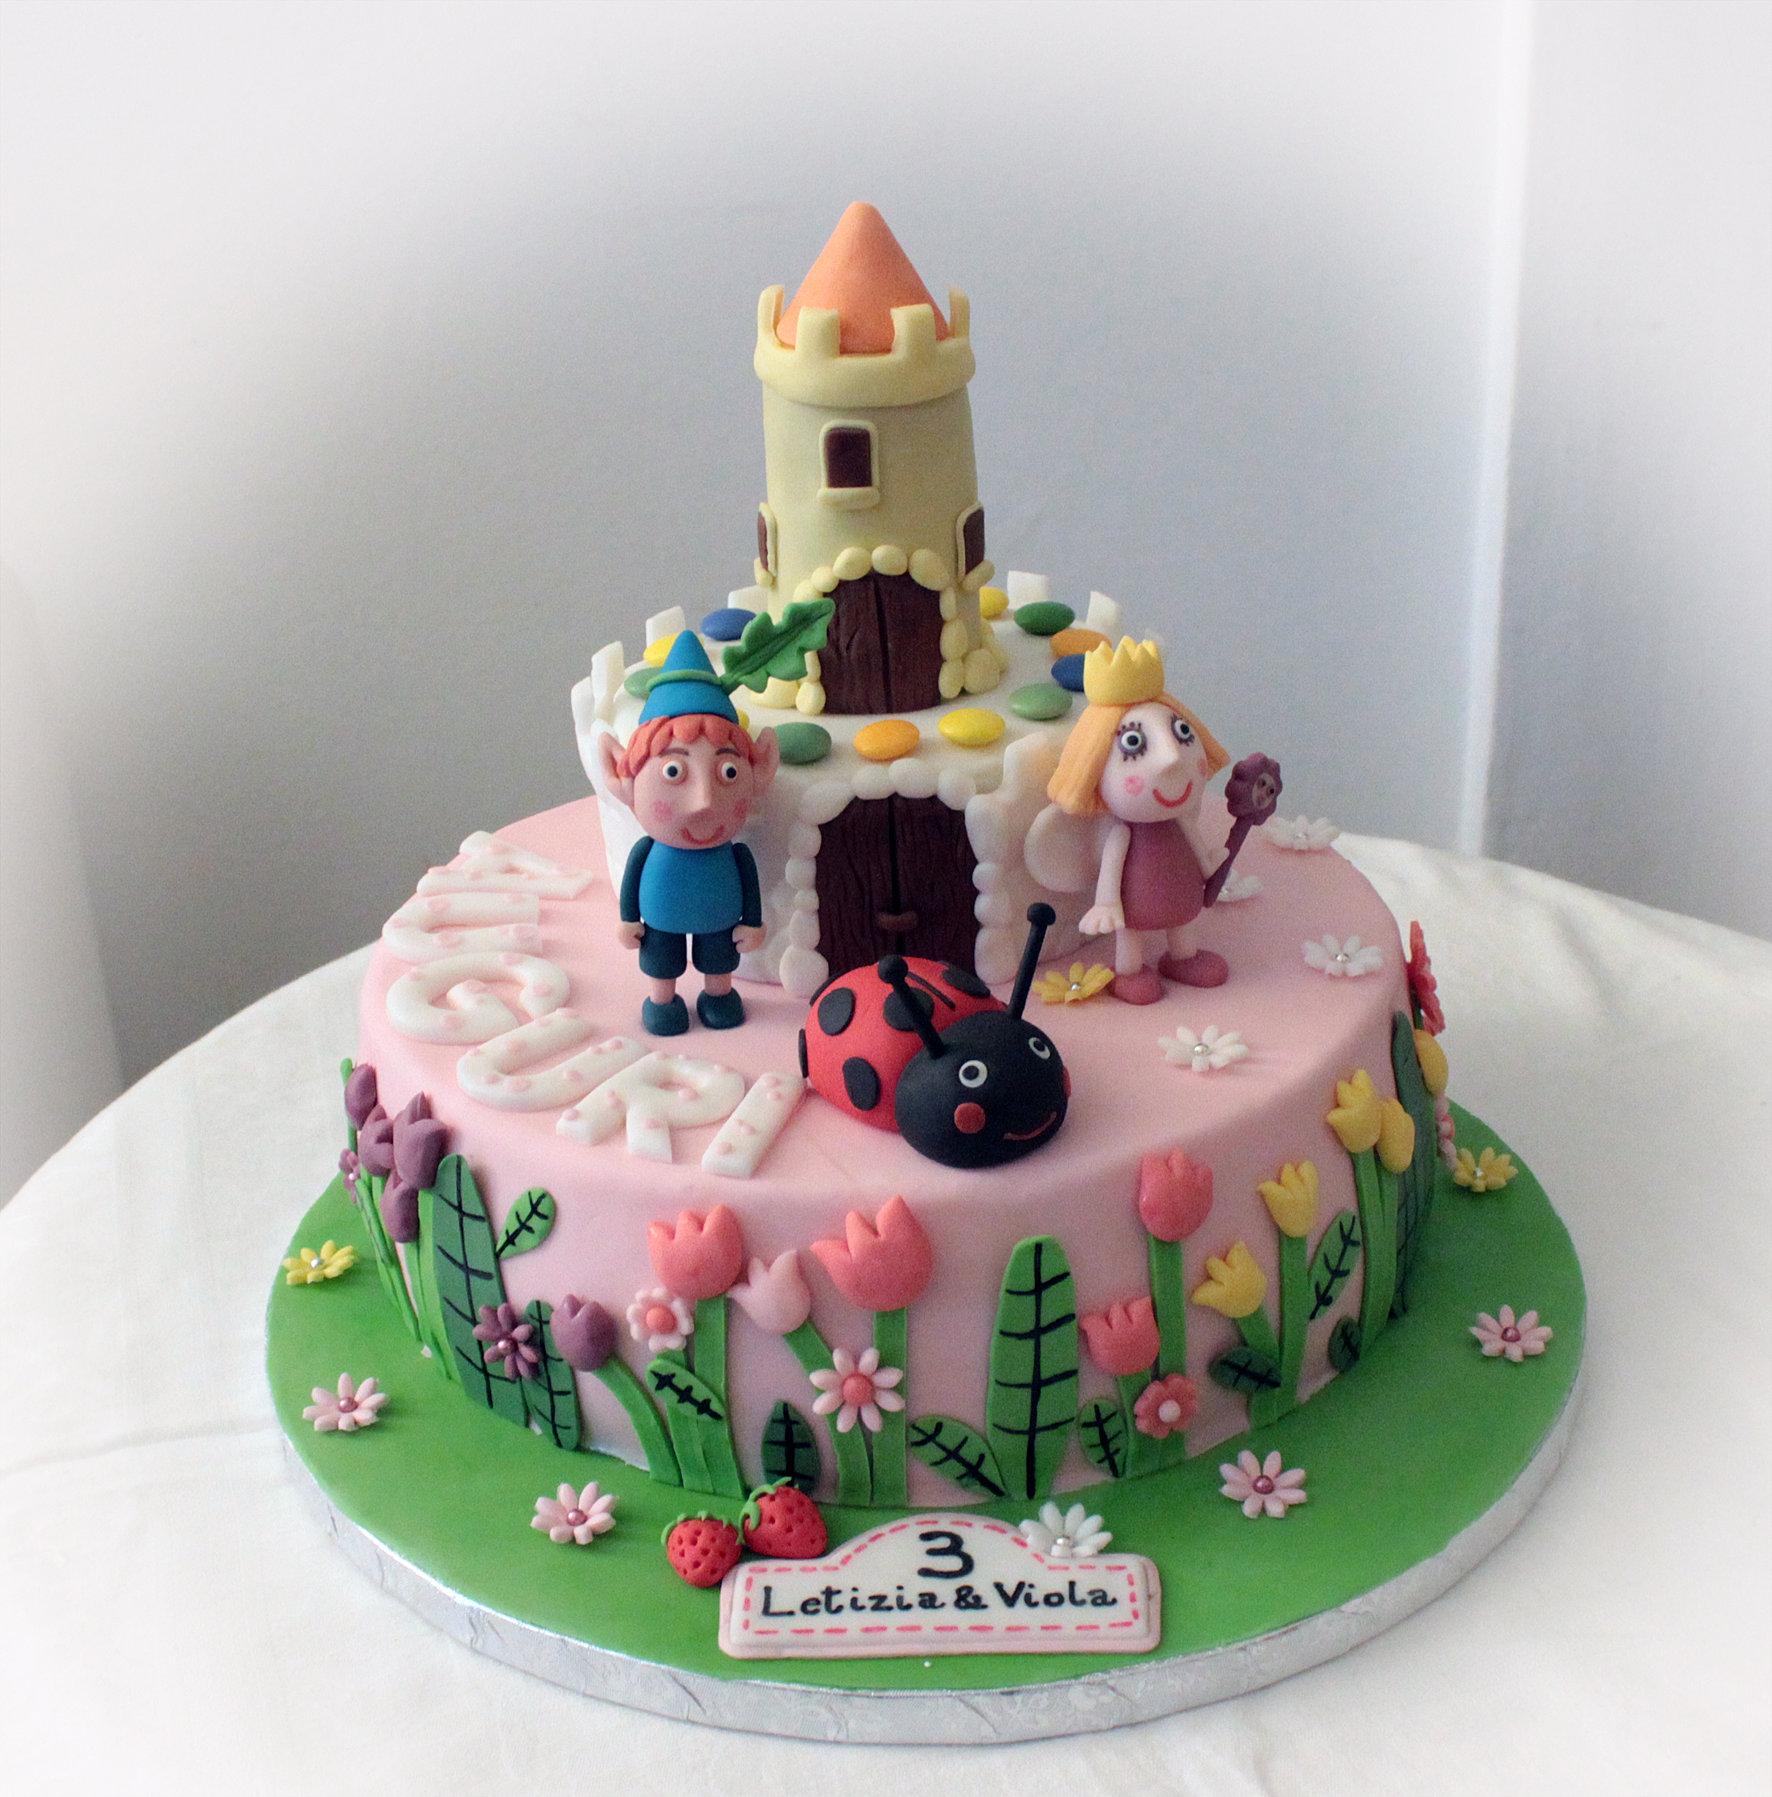 Cake design rimini e piacenza cuore di zucchero mamicake